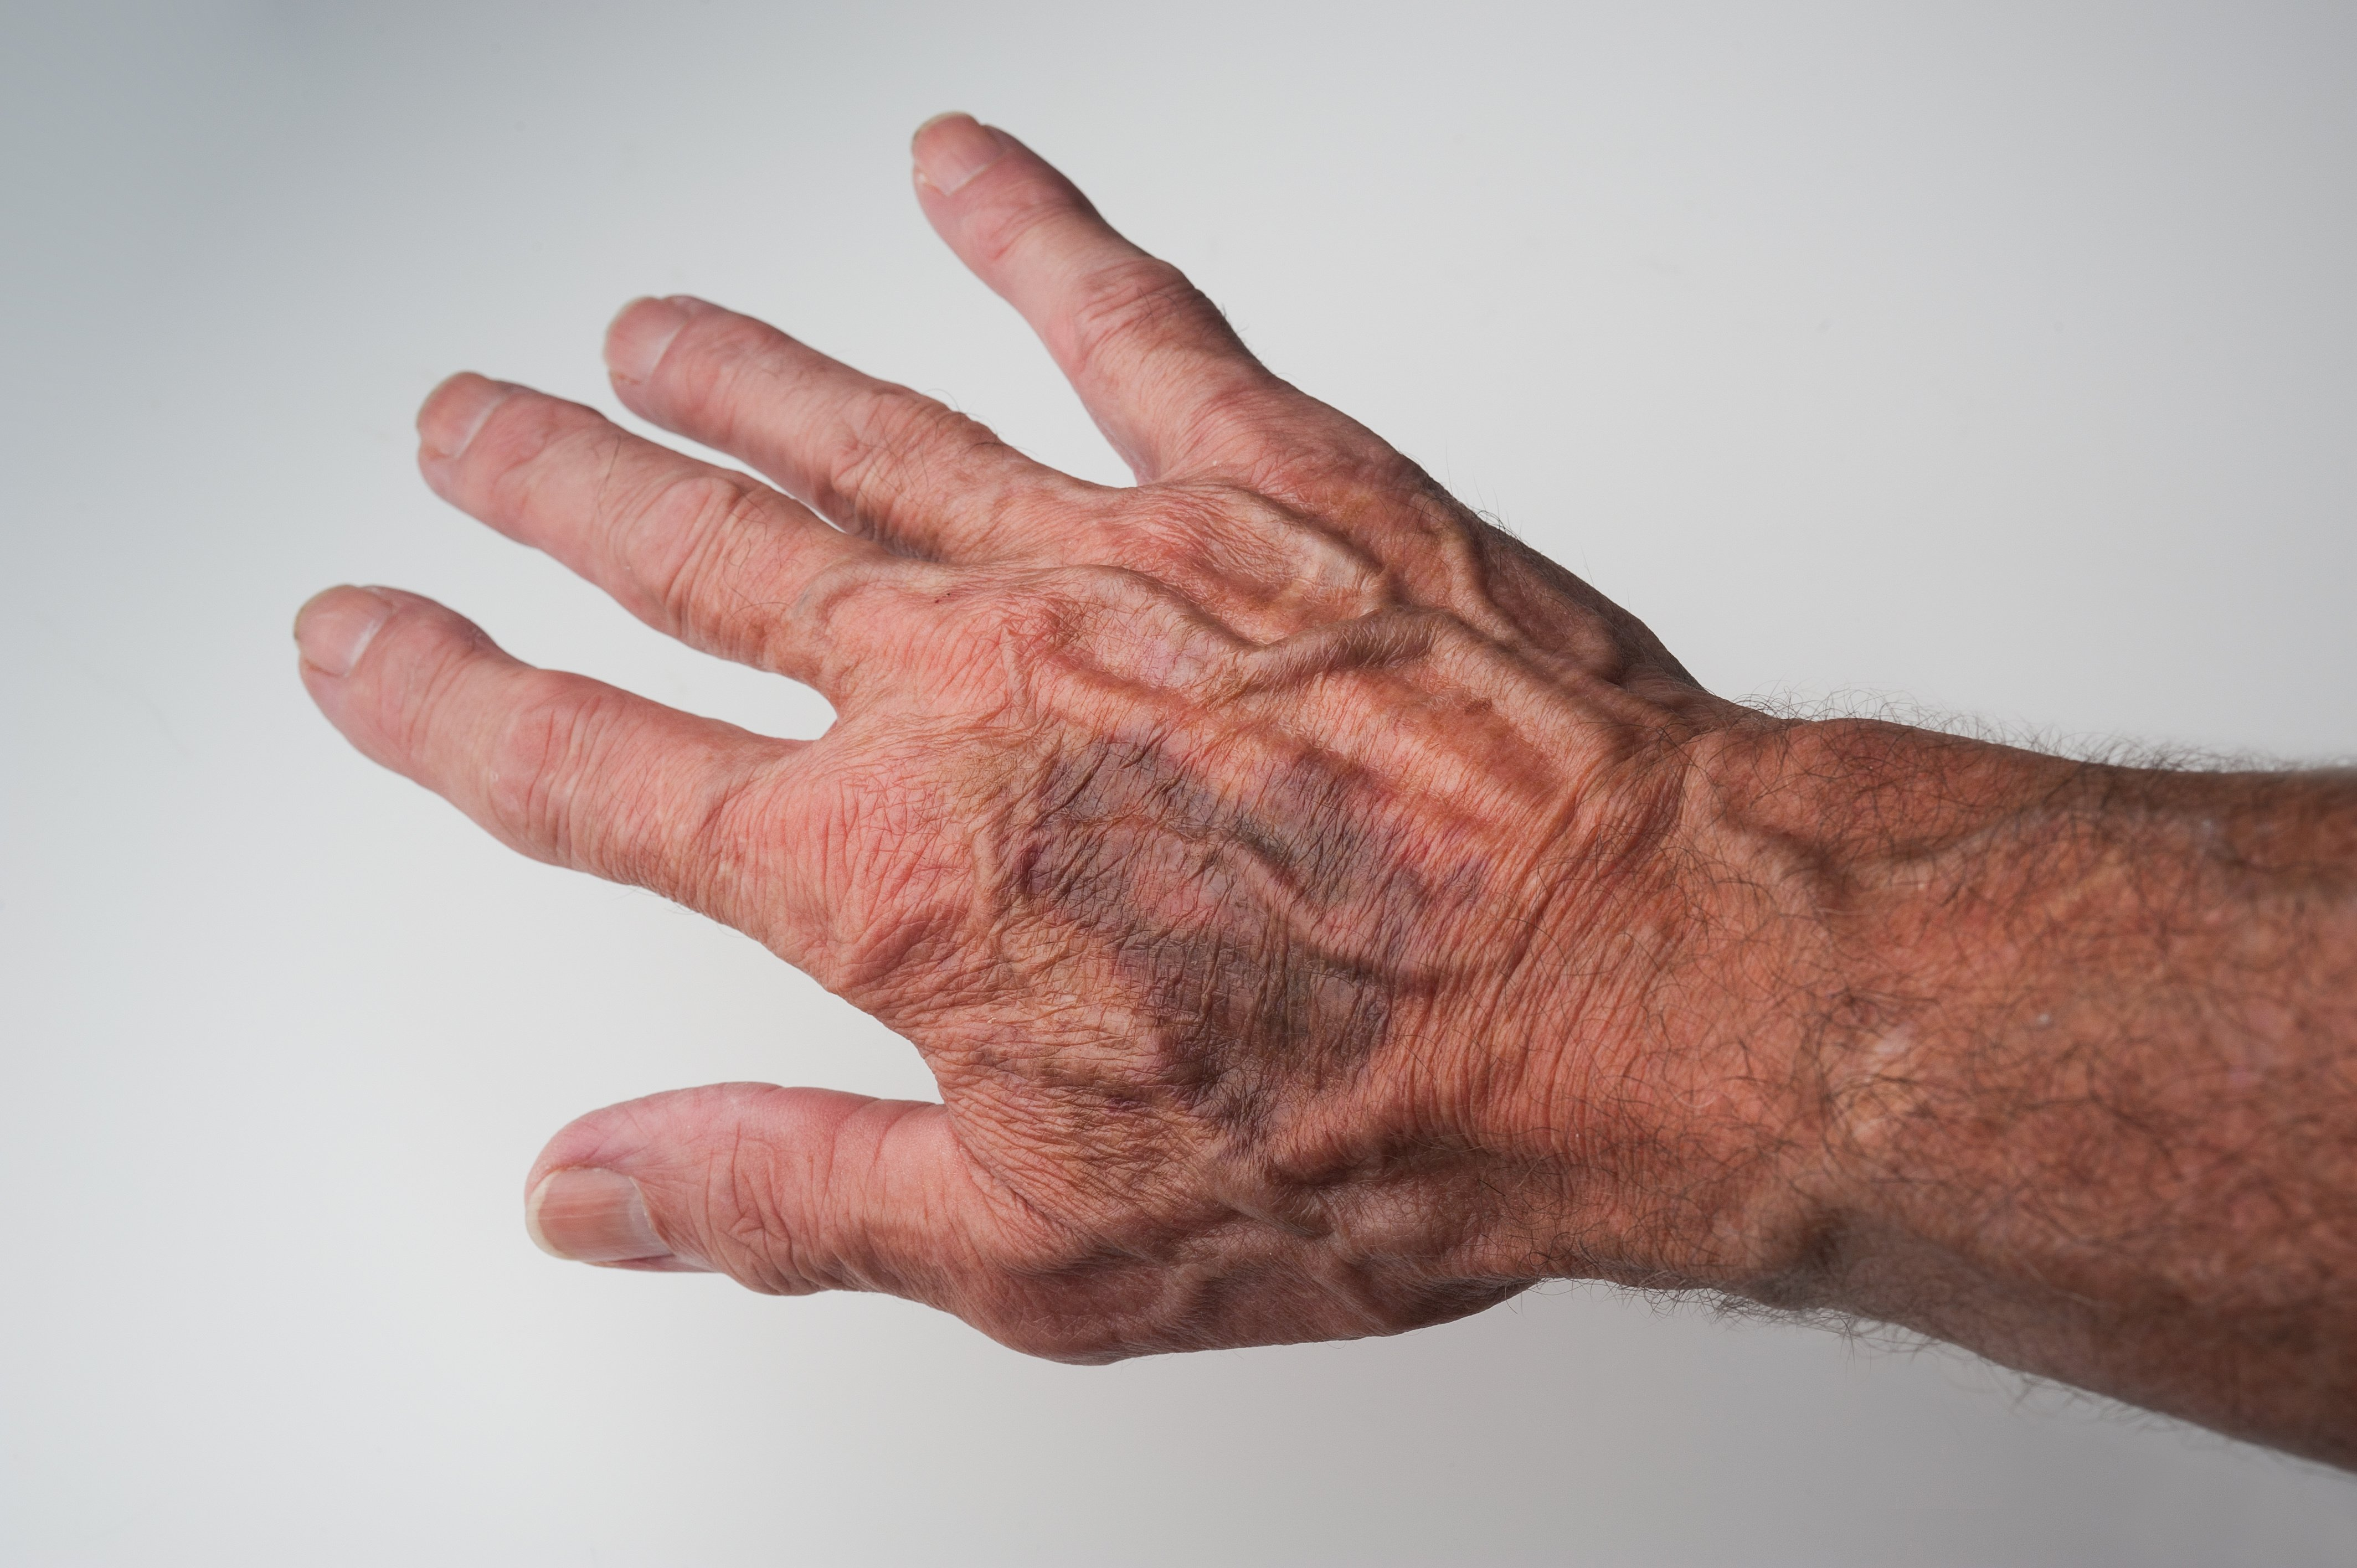 Prominent Hand Veins